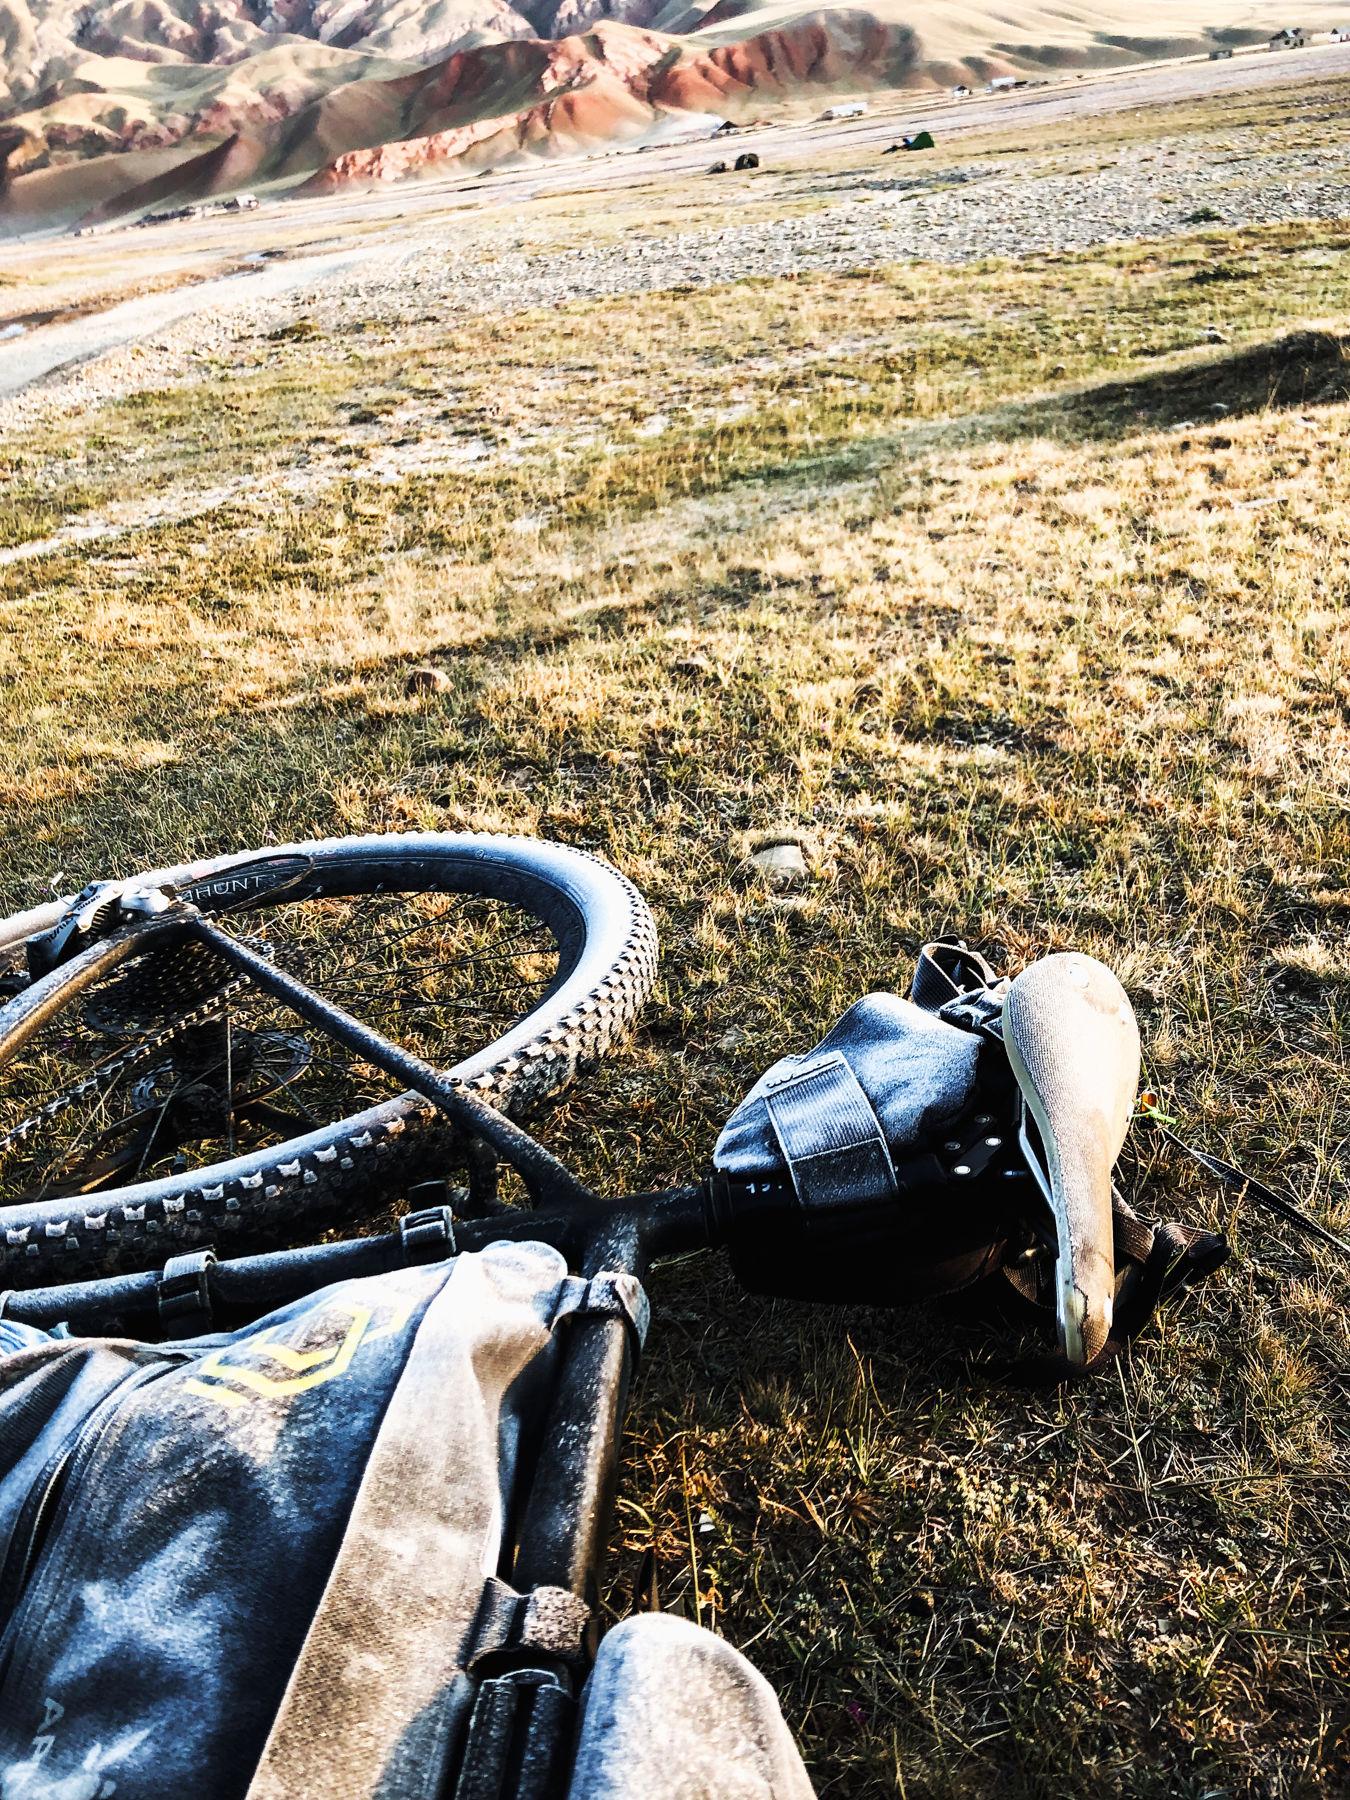 Cold mornings in Kyrgyzstan.